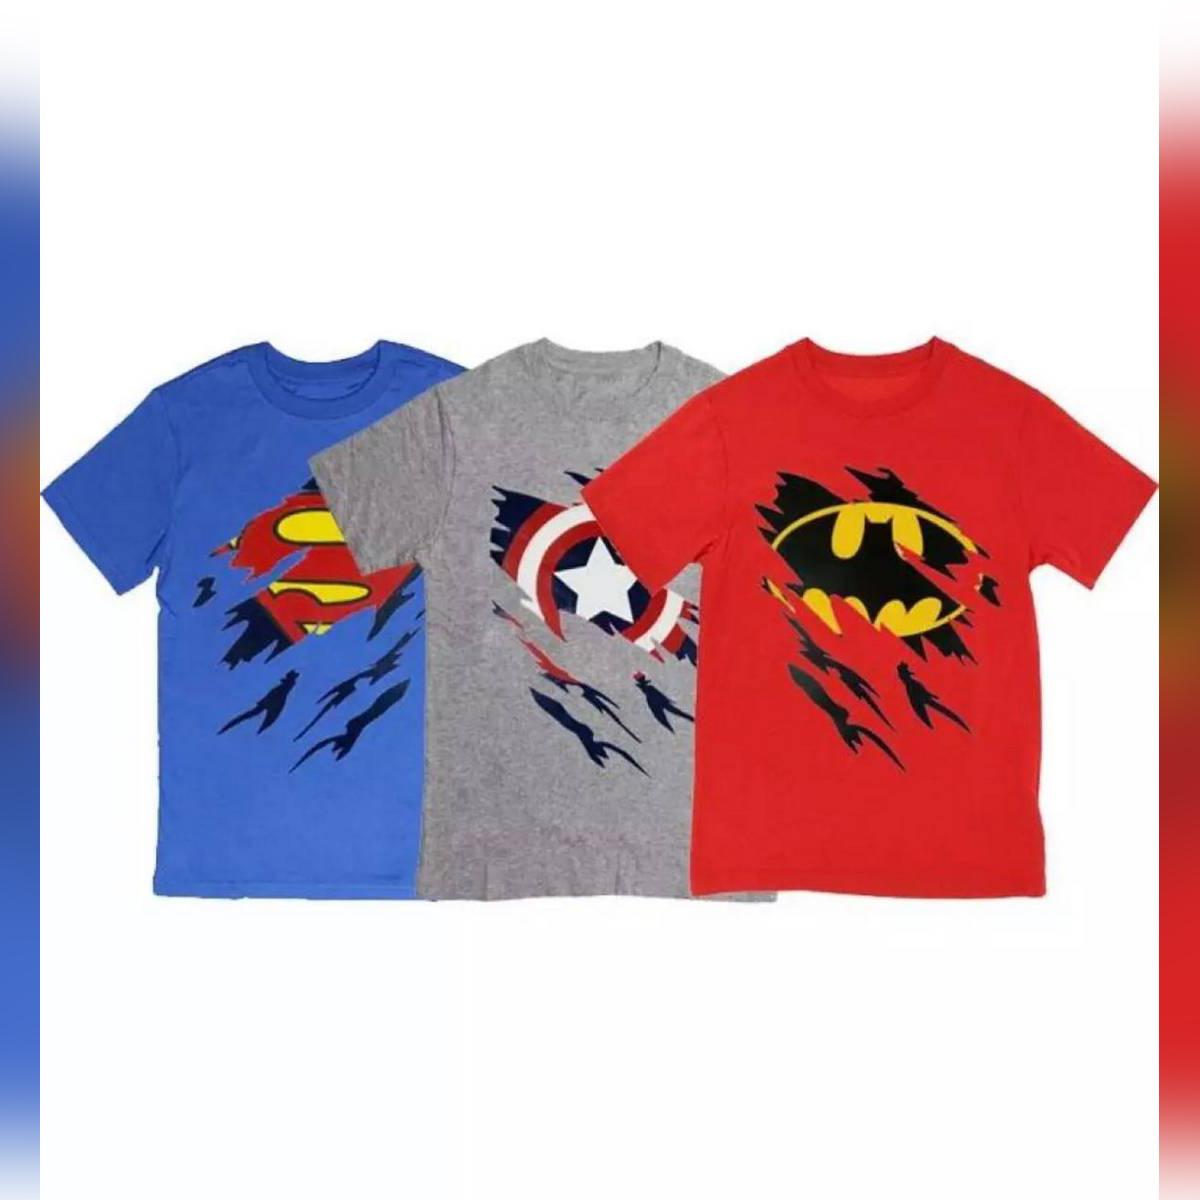 Pack Of 3 Smart Printed Super Hero Tshirt For Kids